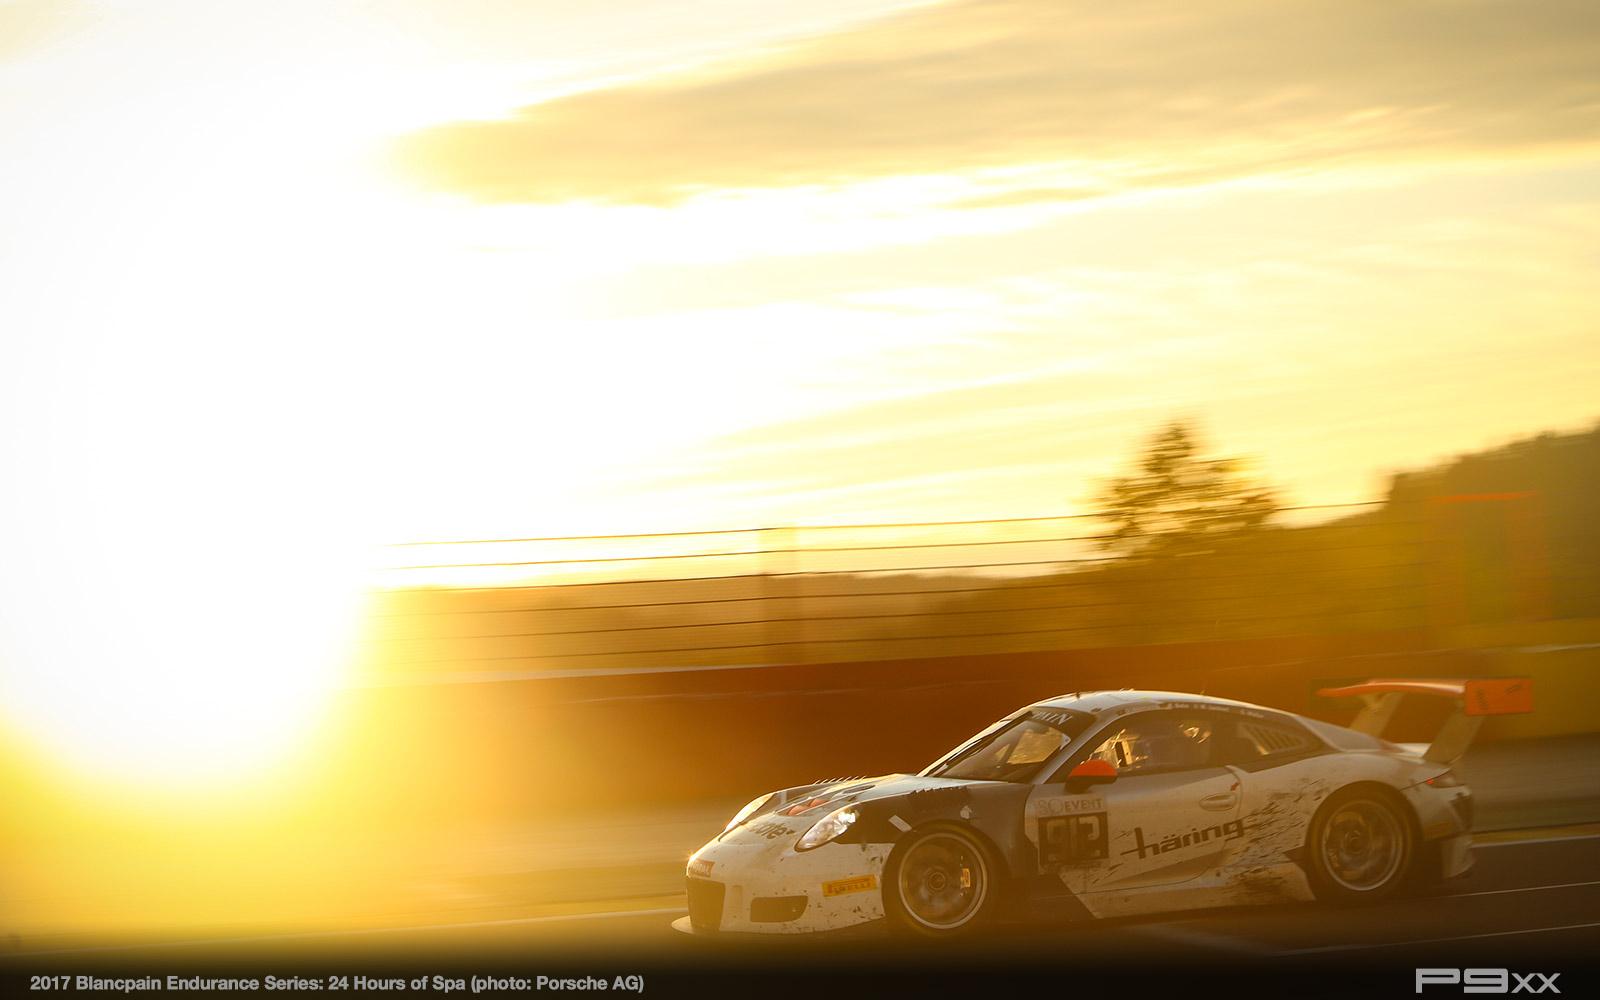 2017-24-Hours-of-Spa-Porsche-369